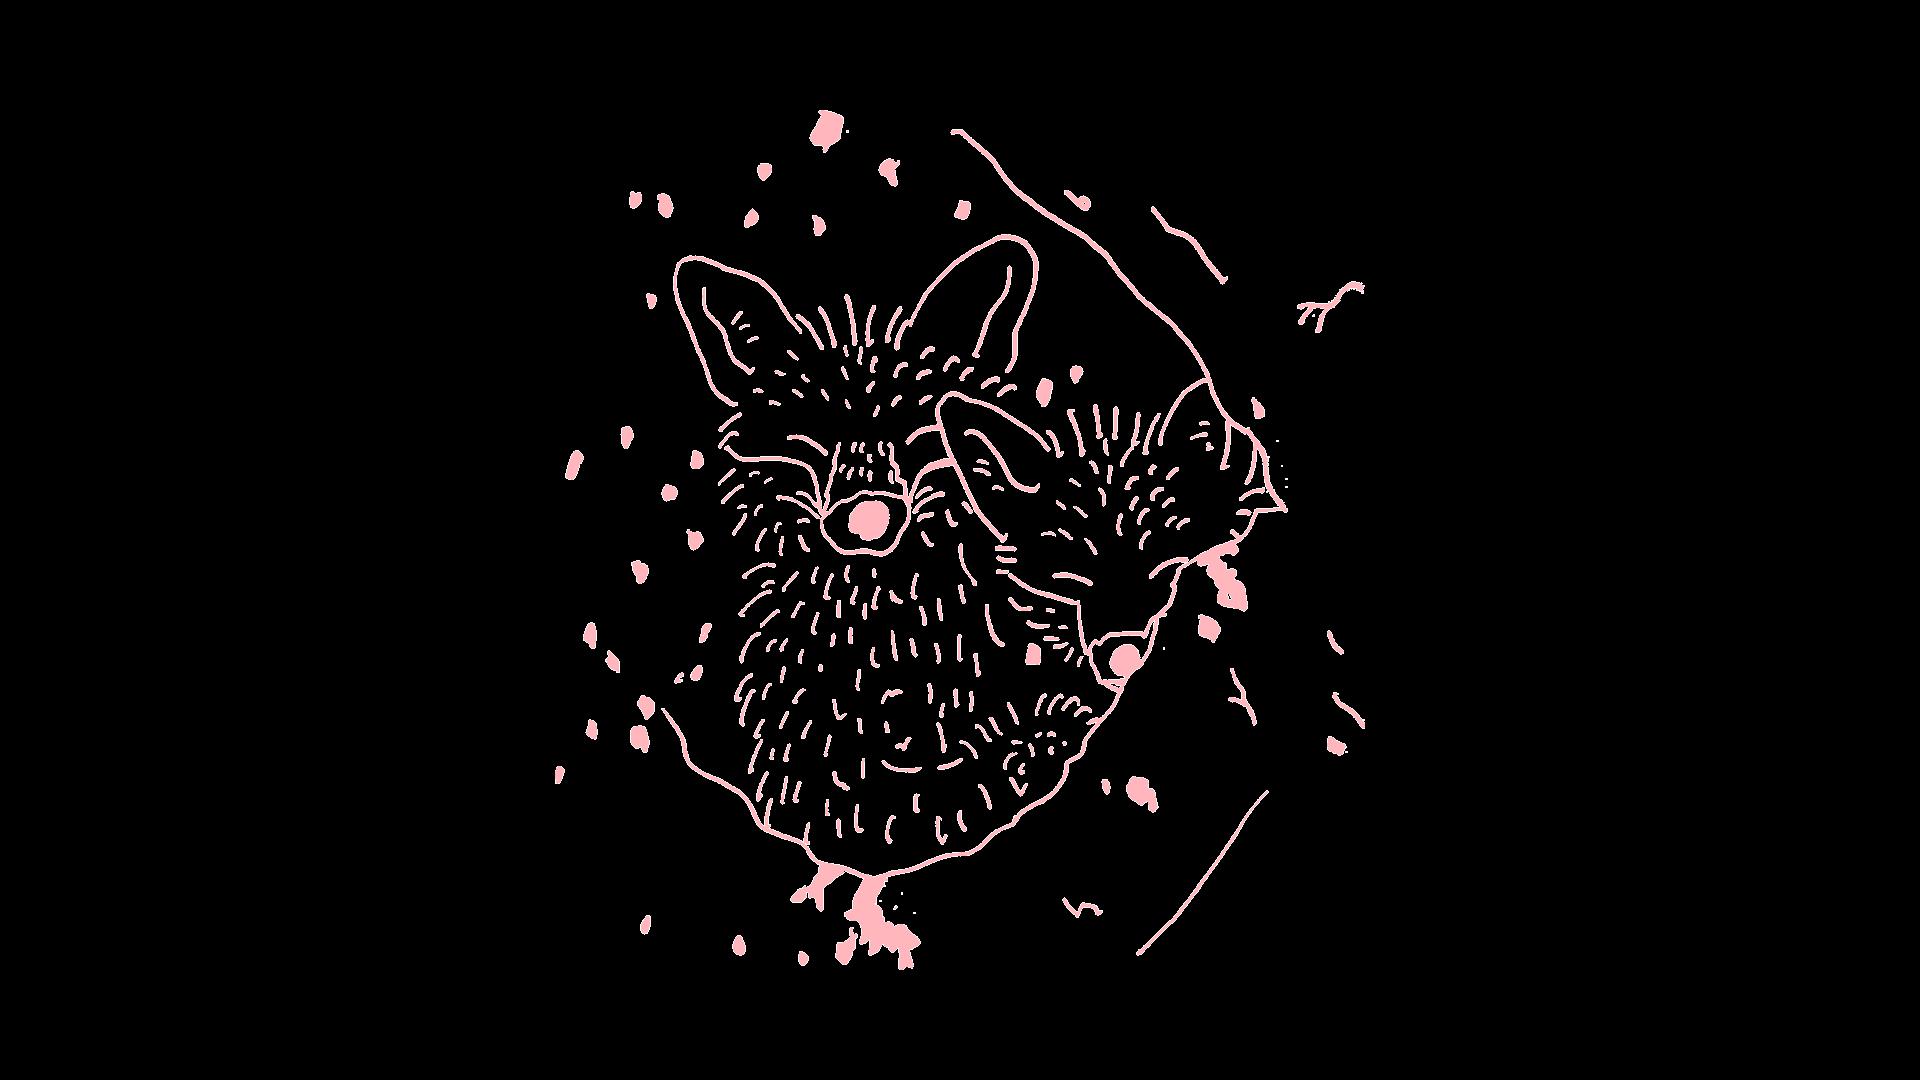 kaity fox